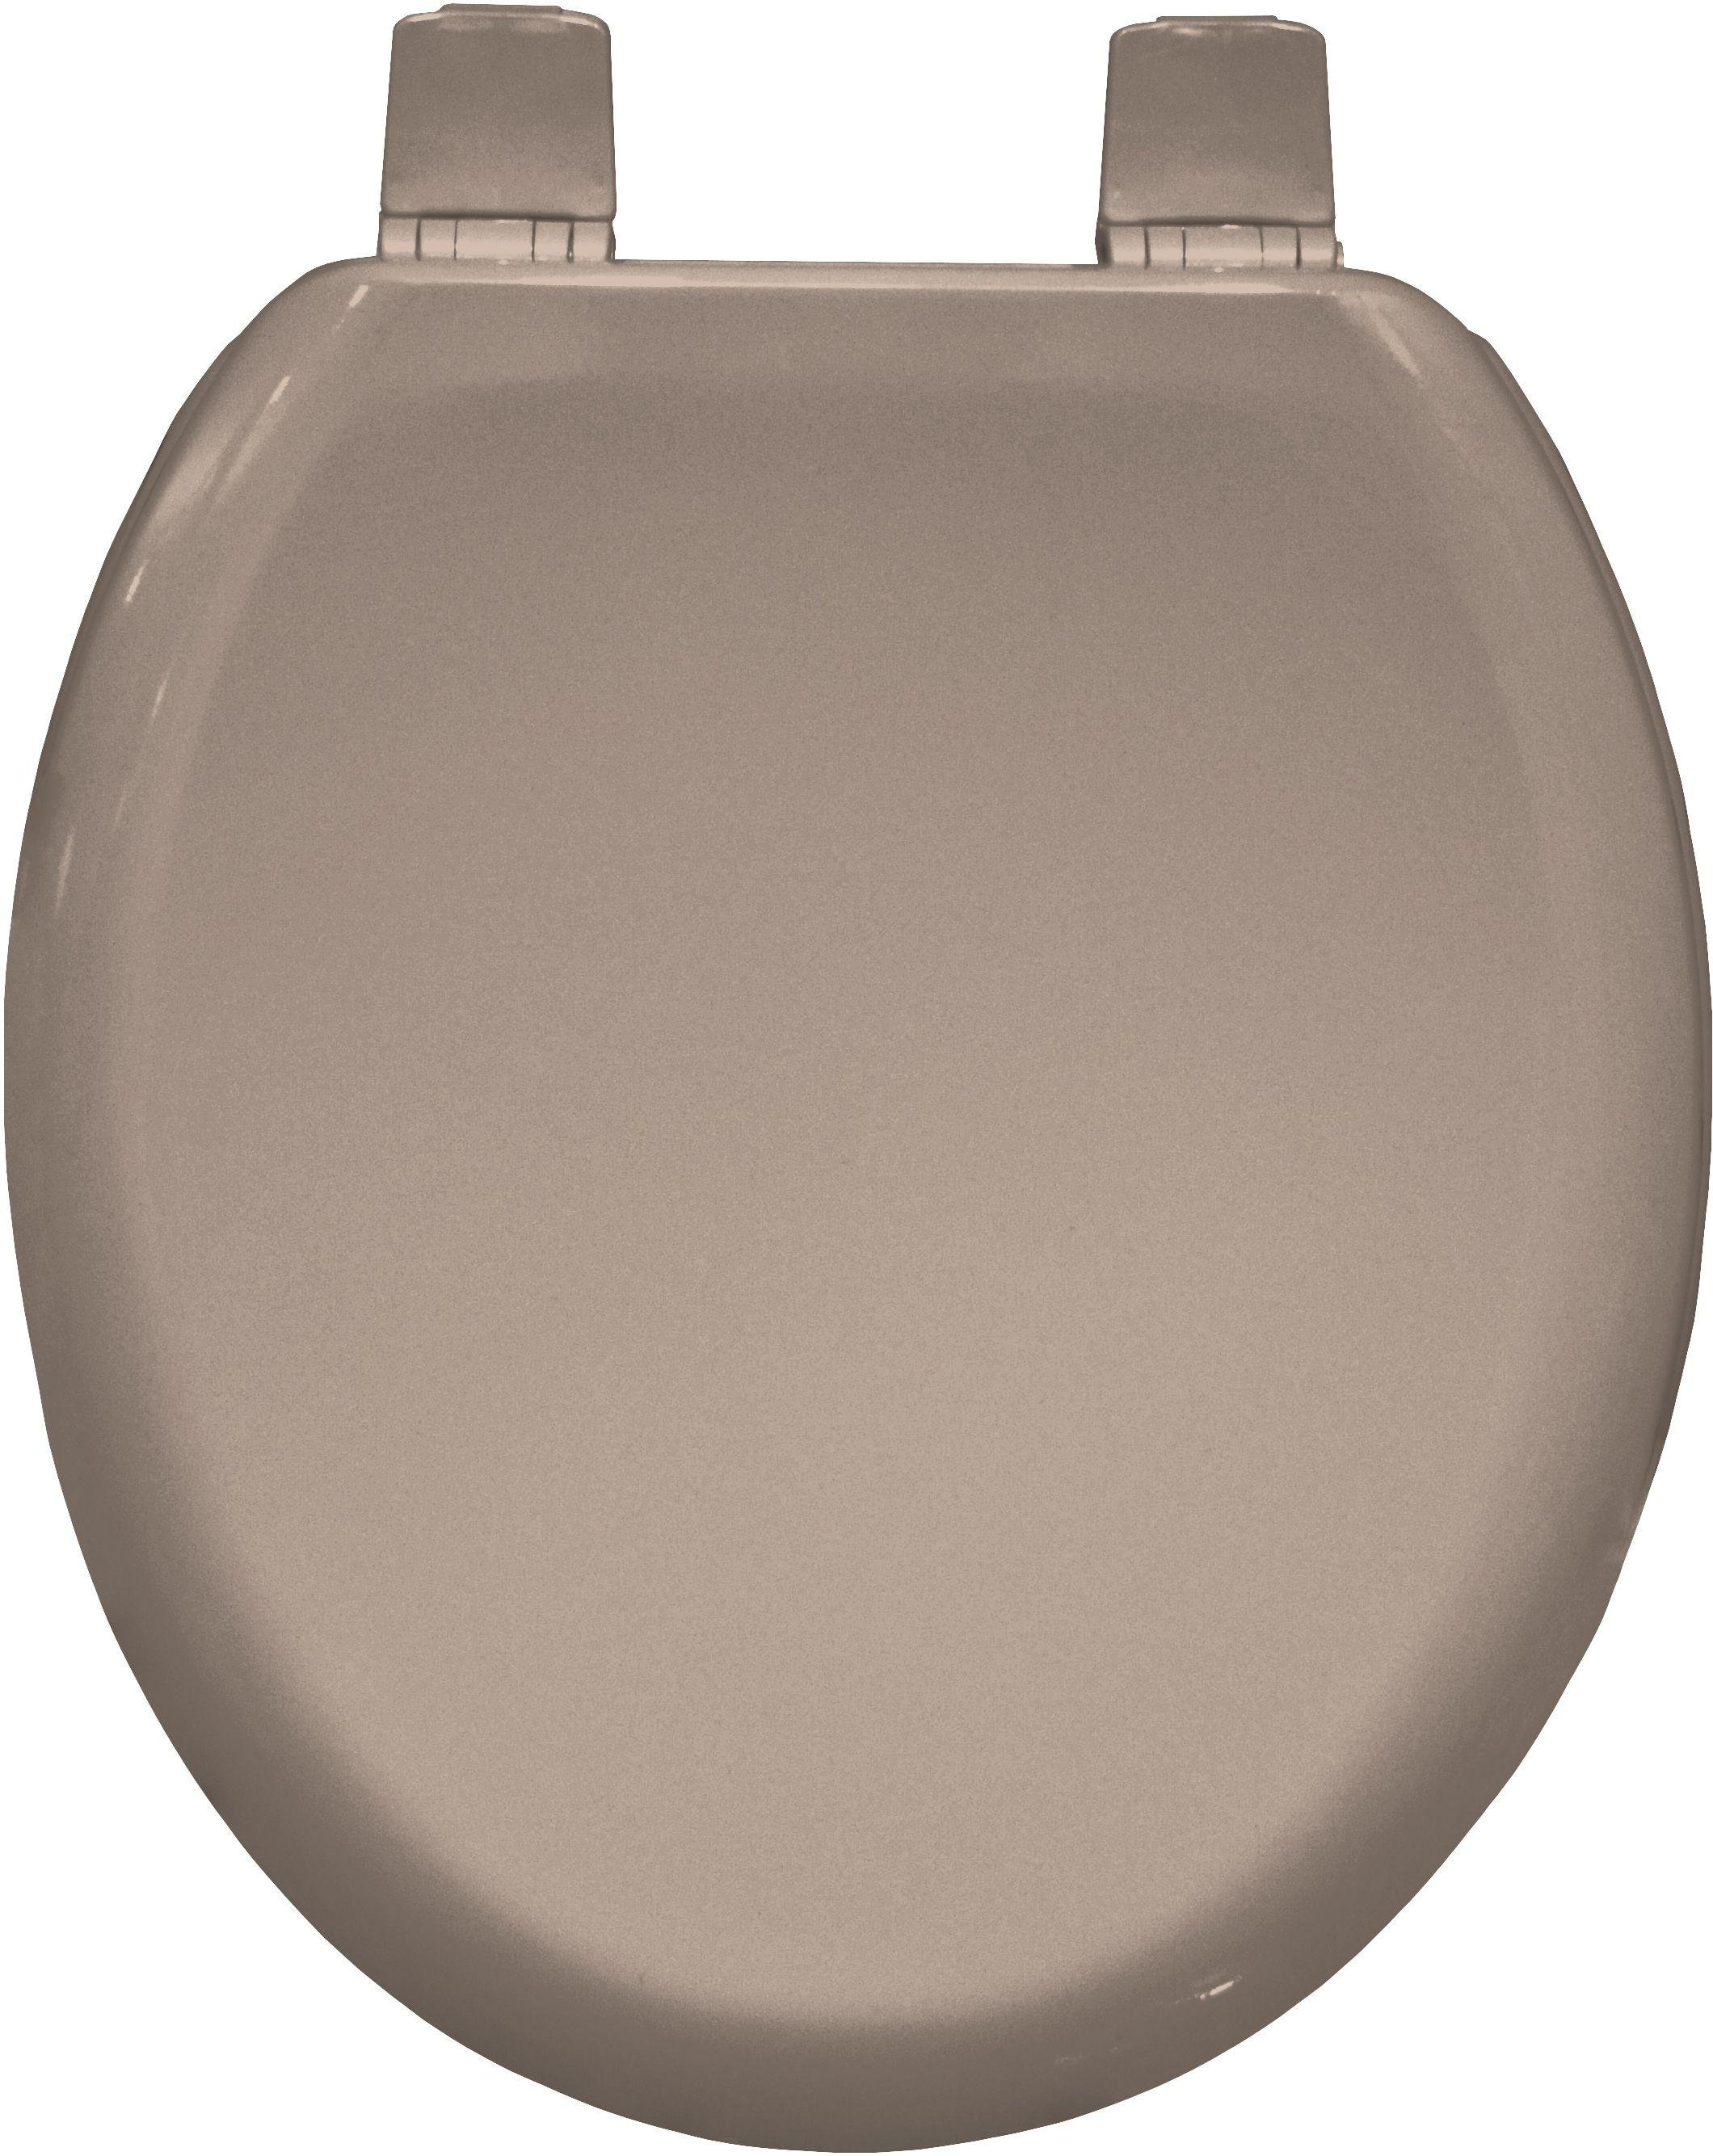 Buy Bemis Chicago Moulded Wood Statite Toilet Seat Soft Cream at